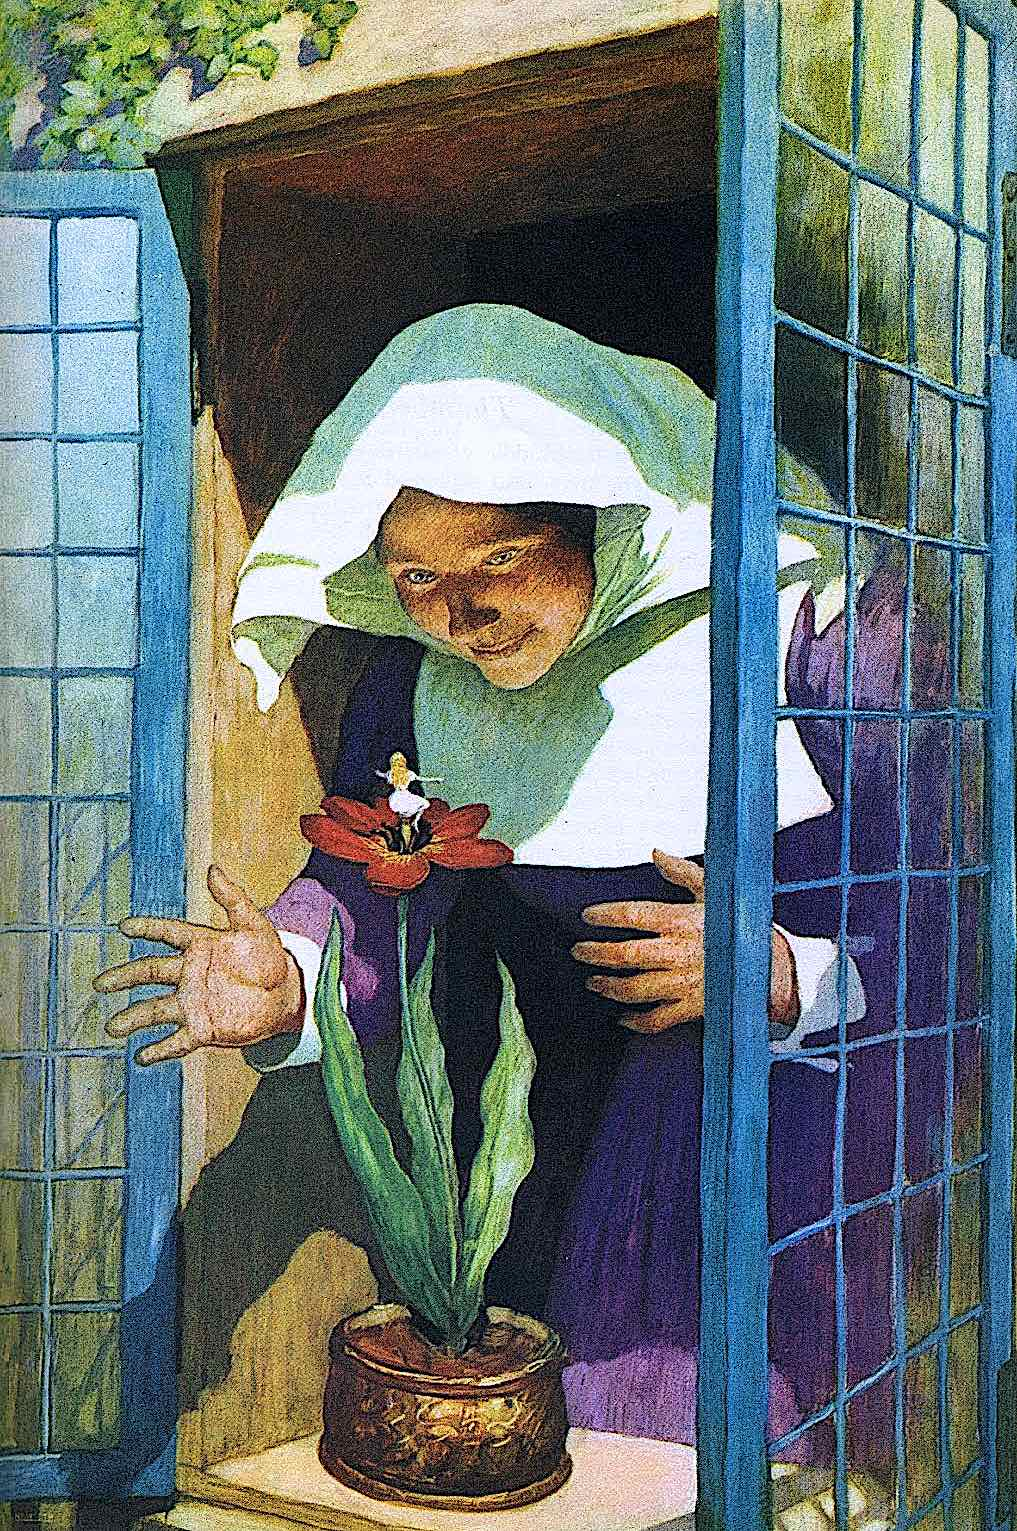 an N.C. Wyeth illustration of a nun